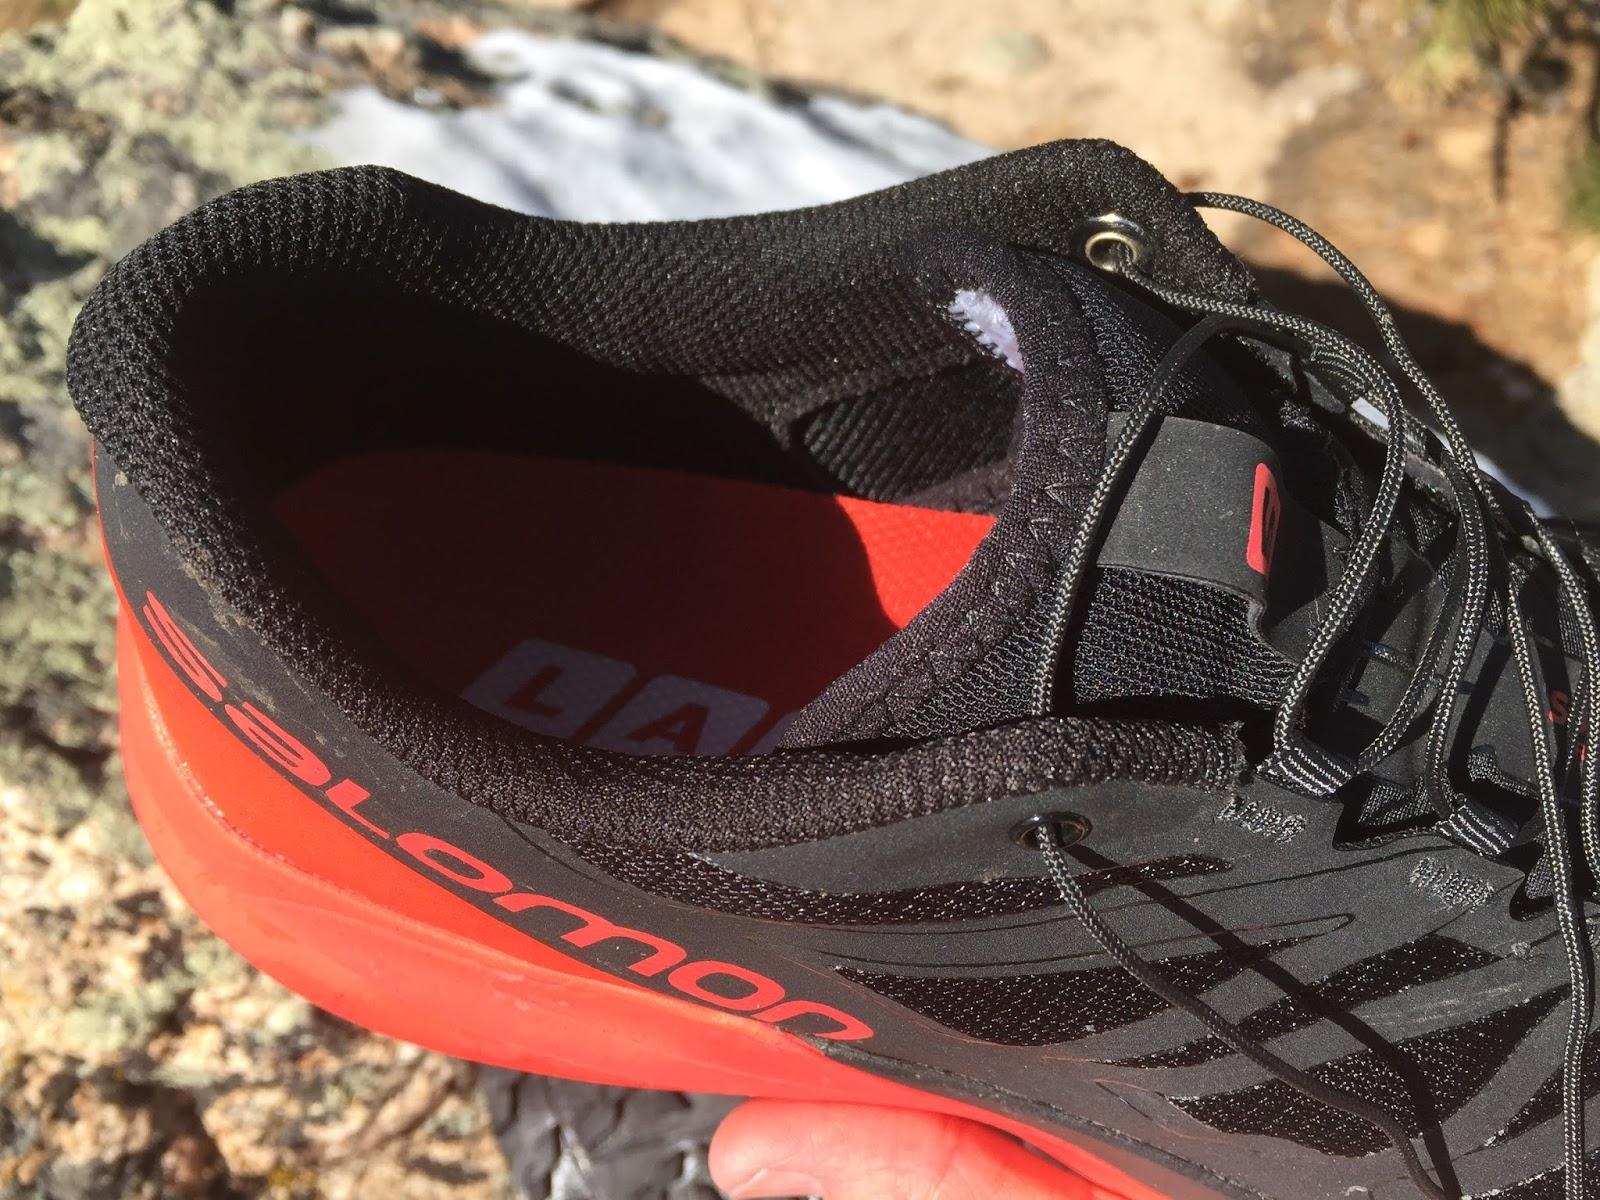 4580547feb38 Road Trail Run  Salomon S-Lab Sense Ultra Review - S-Lab Race ...